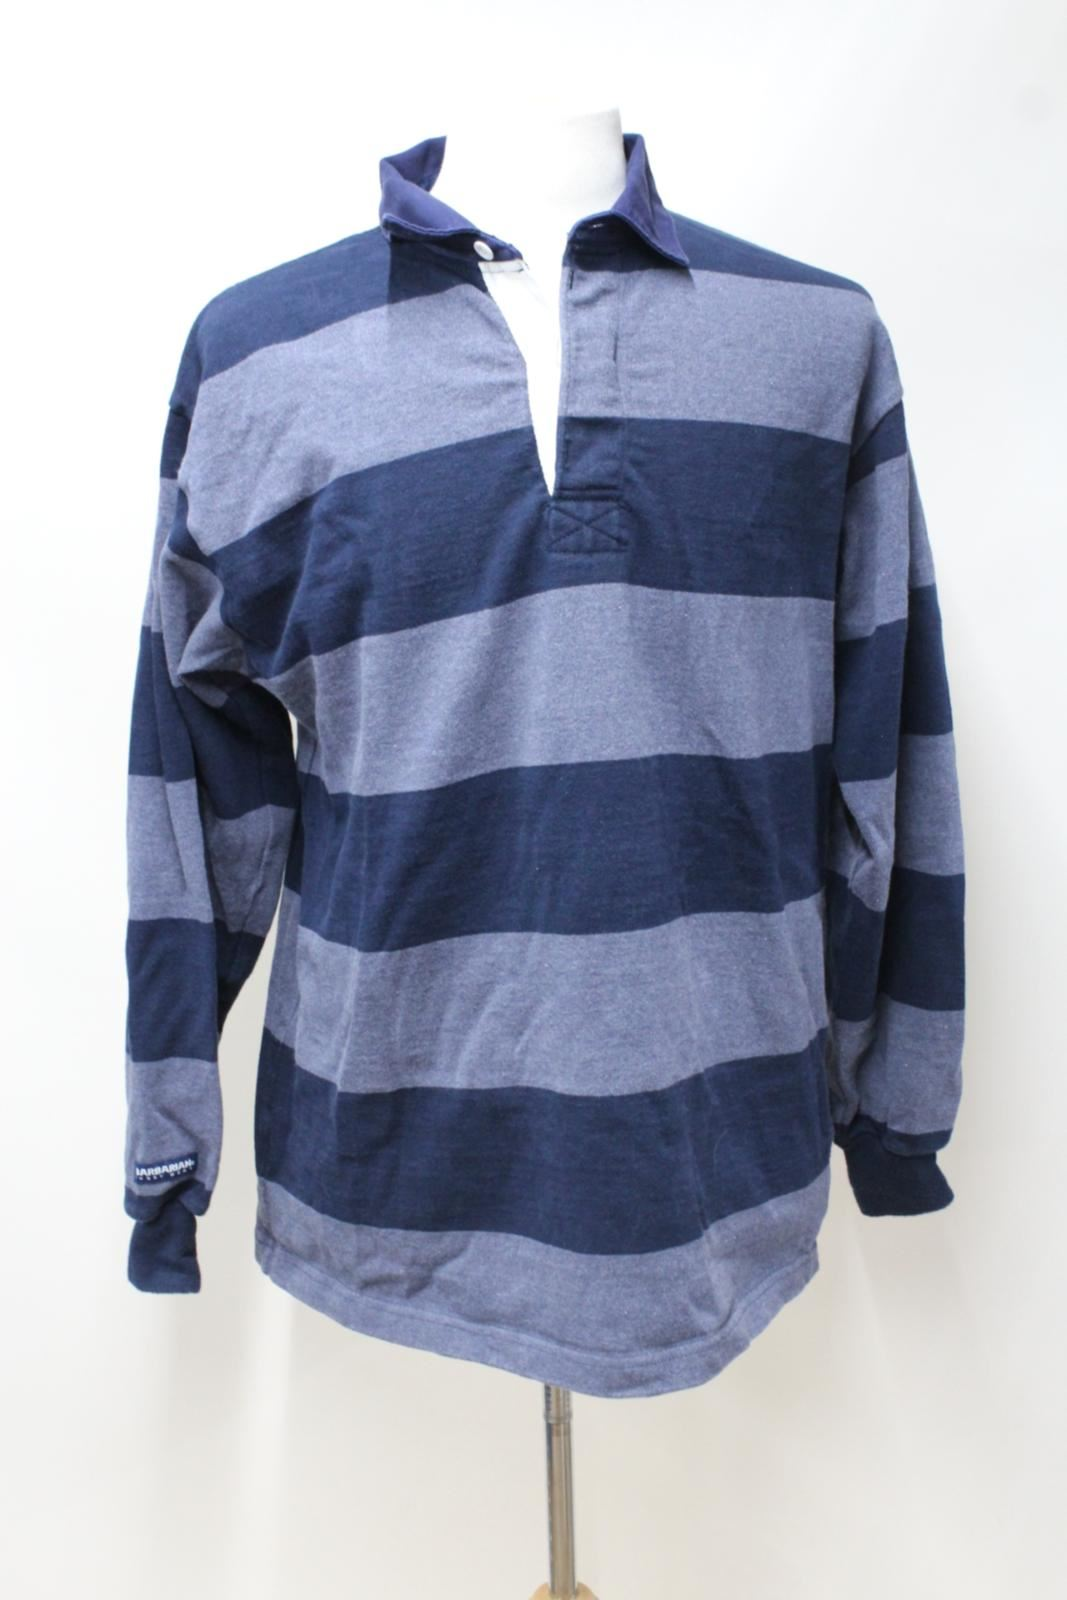 8b92a7e8 BARBARIAN Men's bluee Navy Cotton Striped Long Sleeve Rugby Shirt Top XL NEW